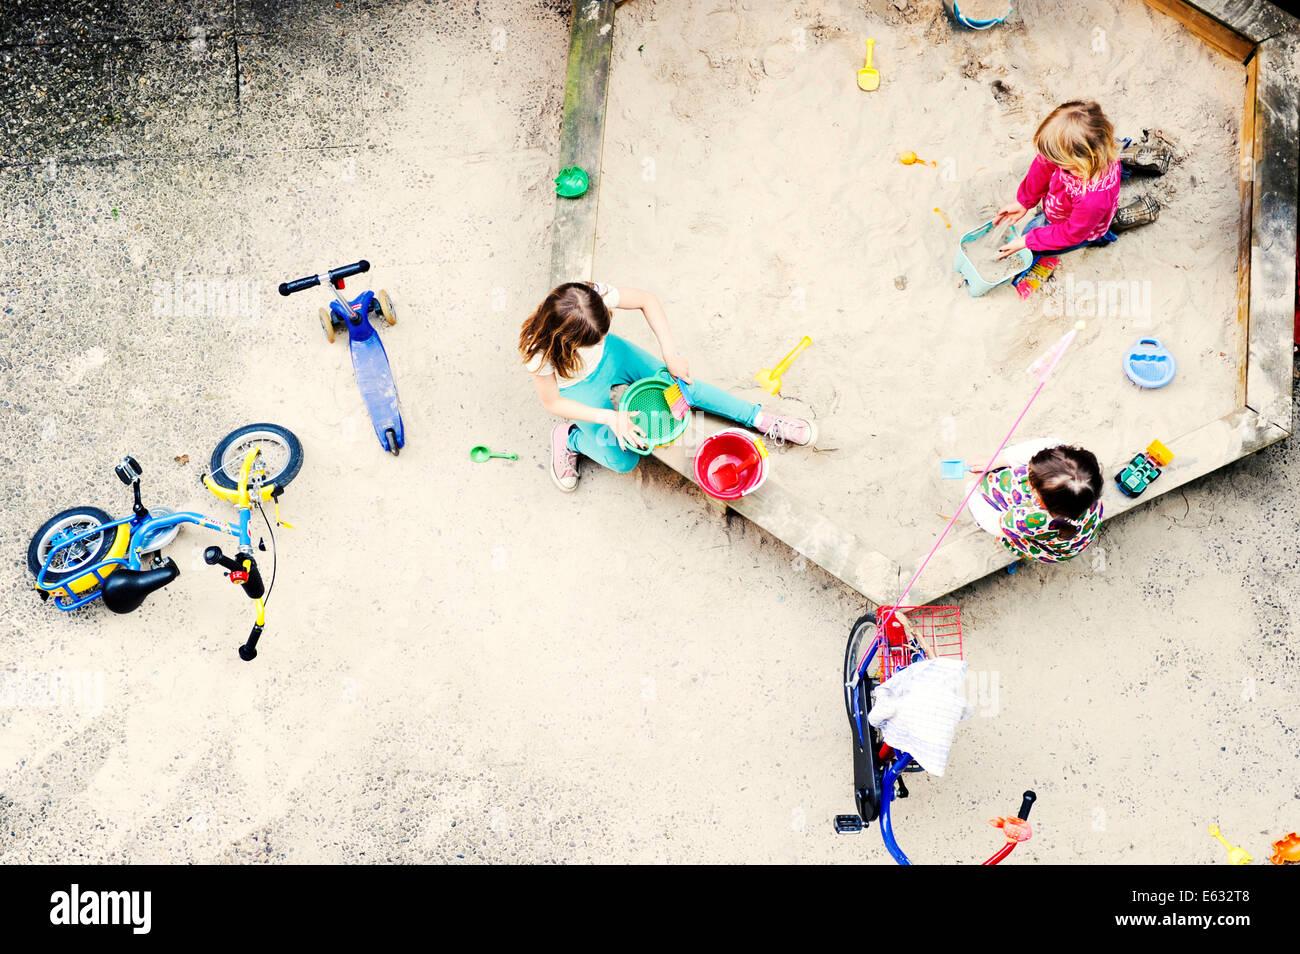 Children playing in the sandbox of a backyard, Düsseldorf, Rhineland, North Rhine-Westphalia, Germany - Stock Image